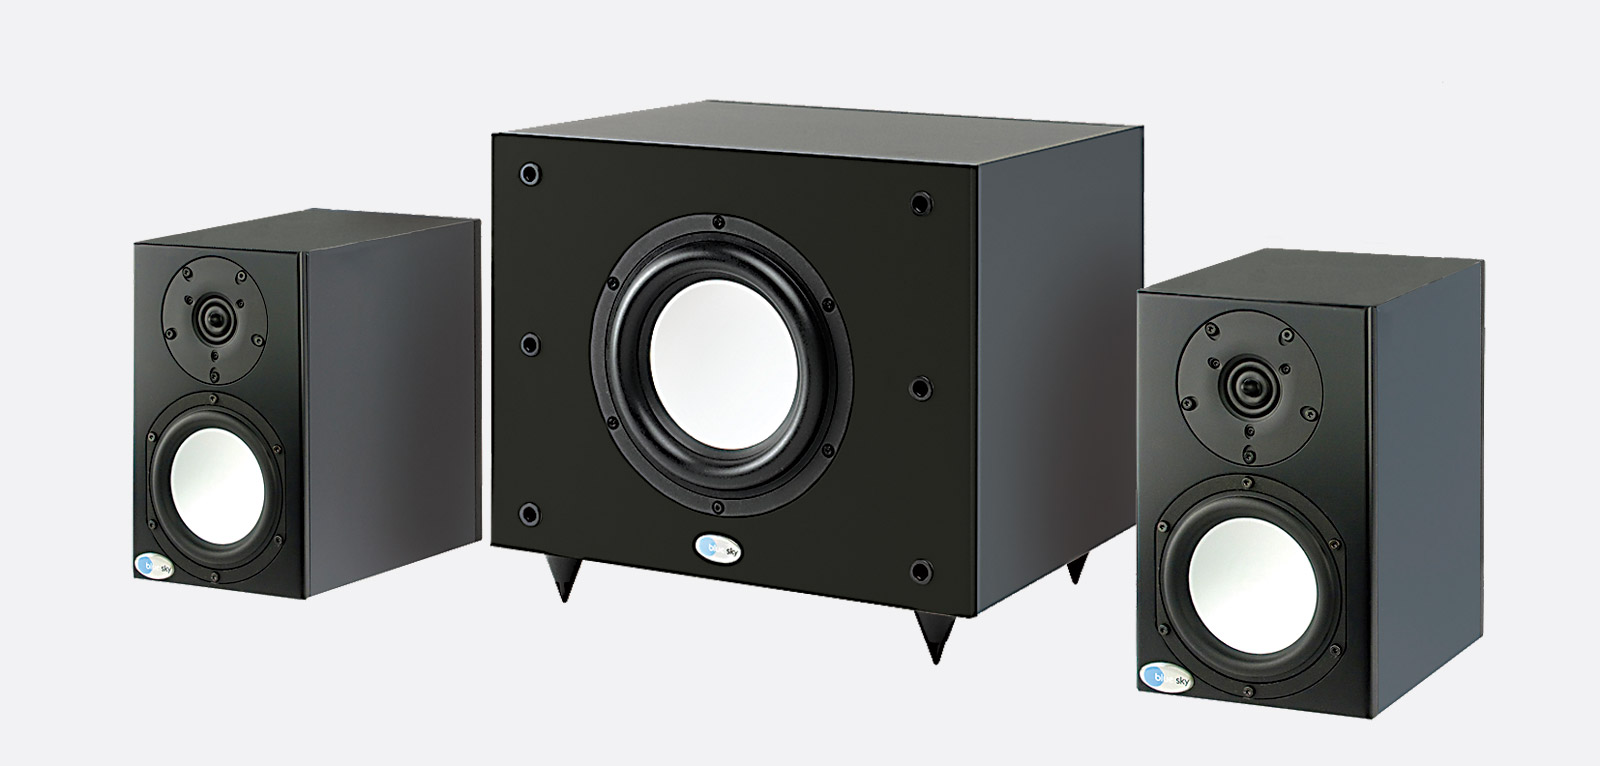 blue sky prodesk mkiii 2.1 systeme haut-parleur actifs, 2x sat5.25